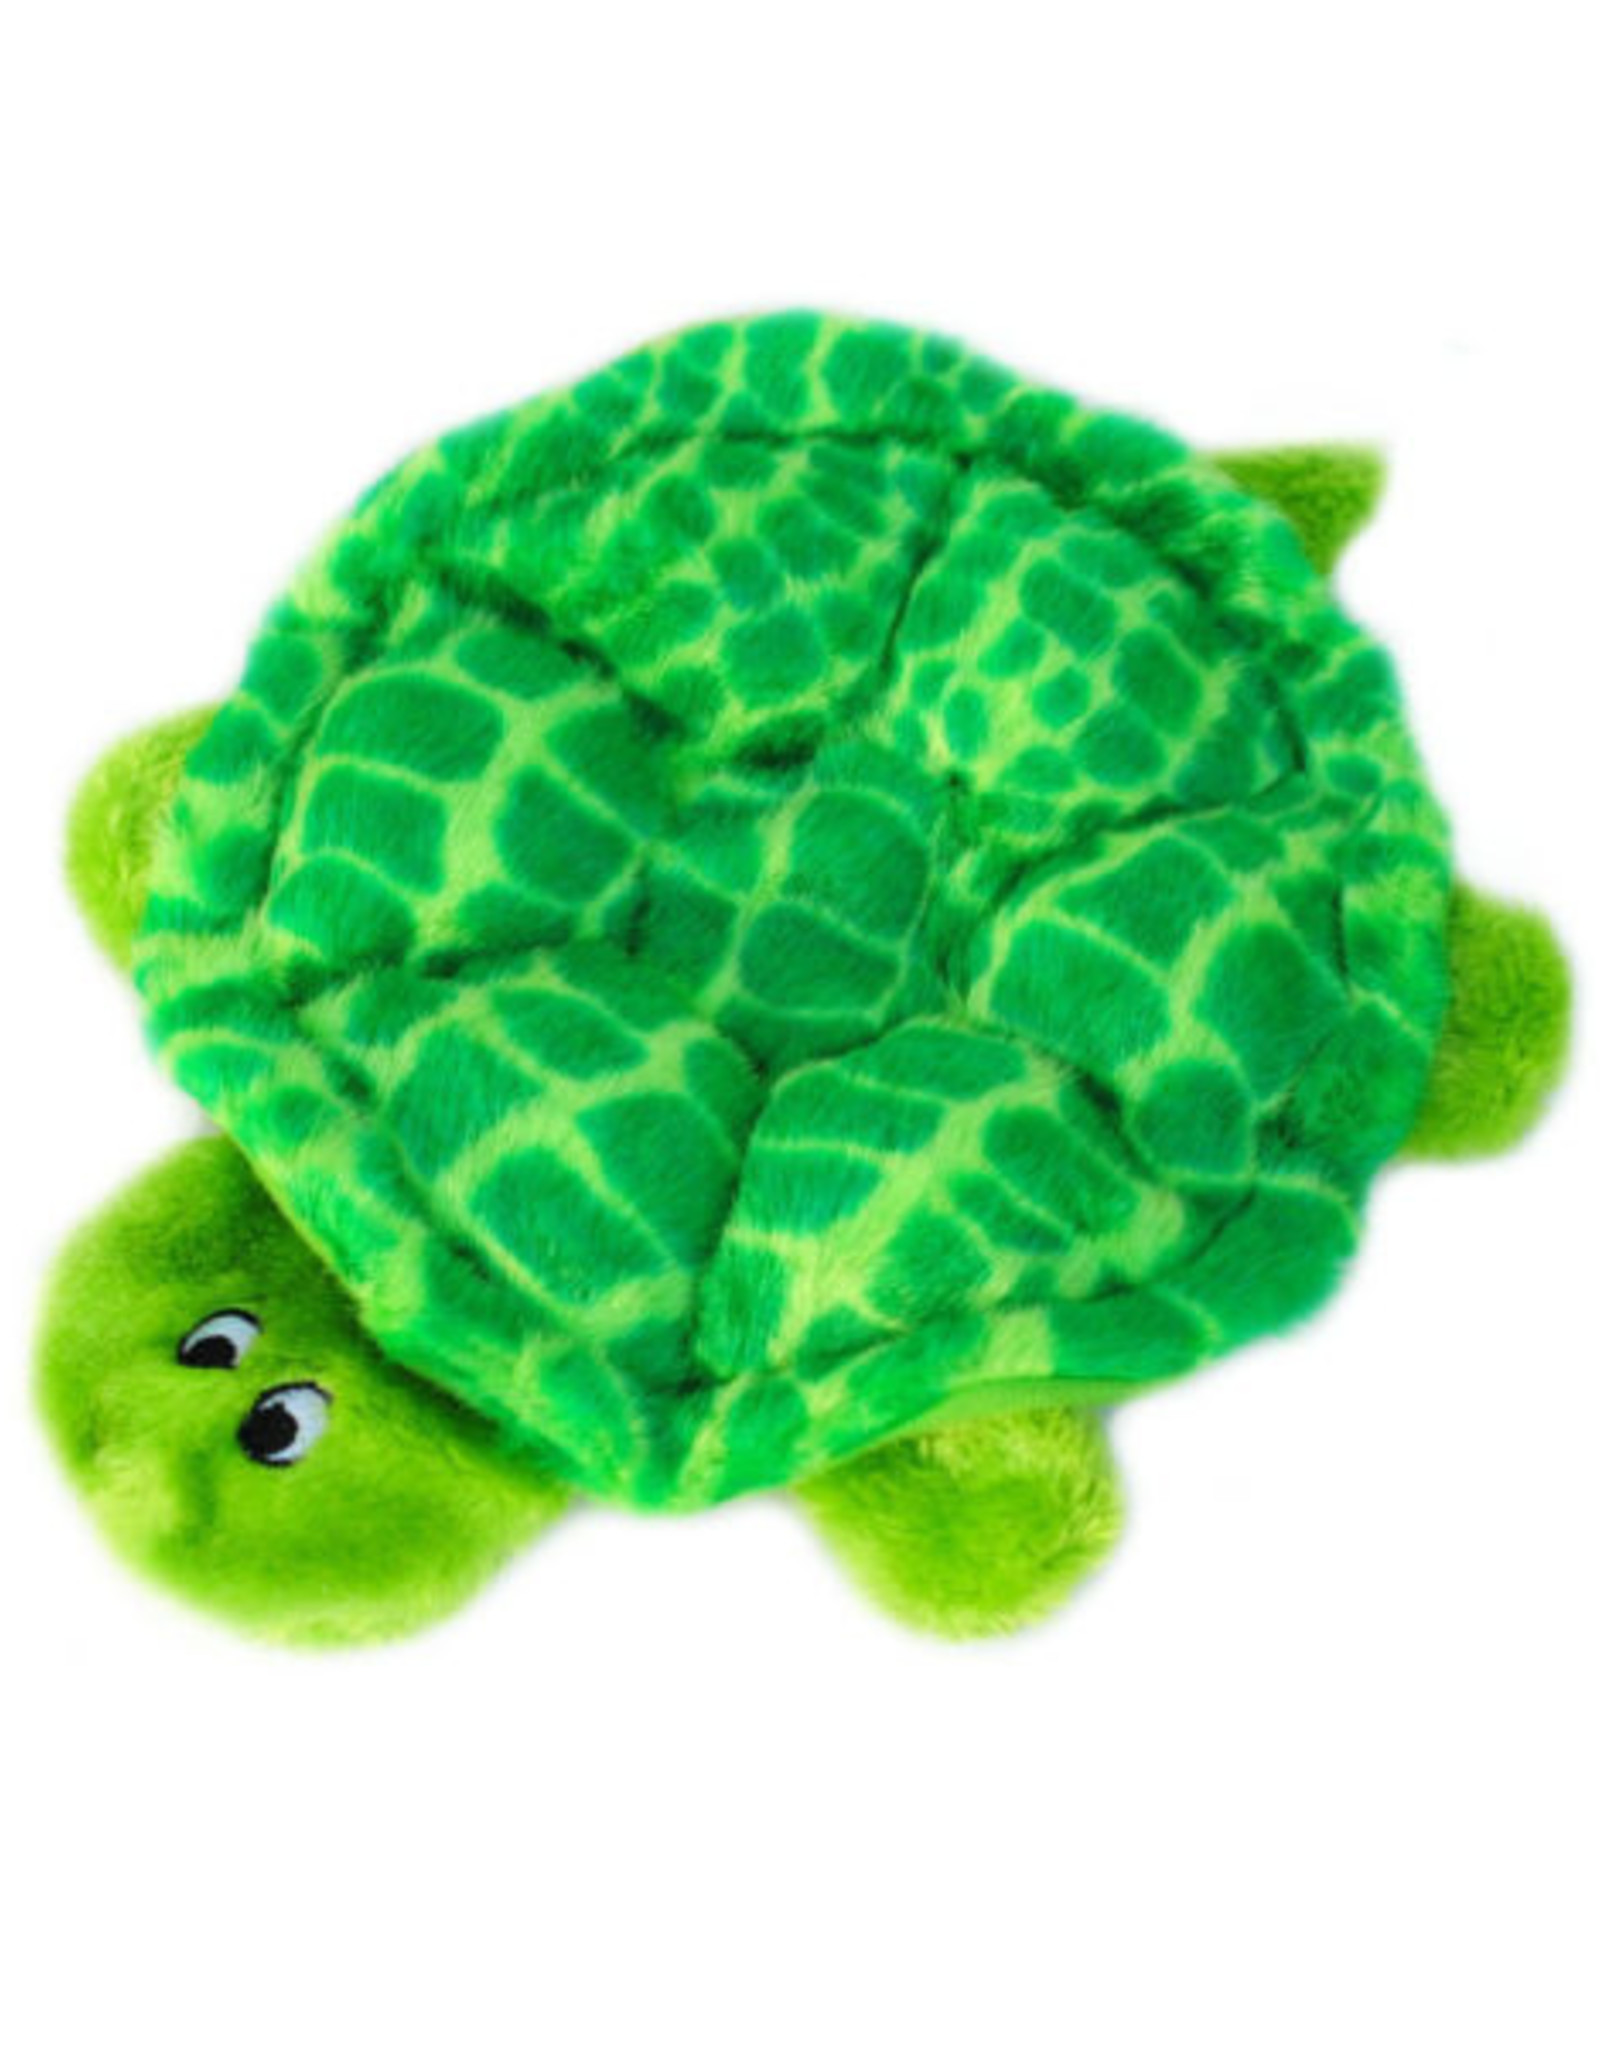 Zippy Paws SlowPoke the Turtle Squeakie Crawlers Dog Toy